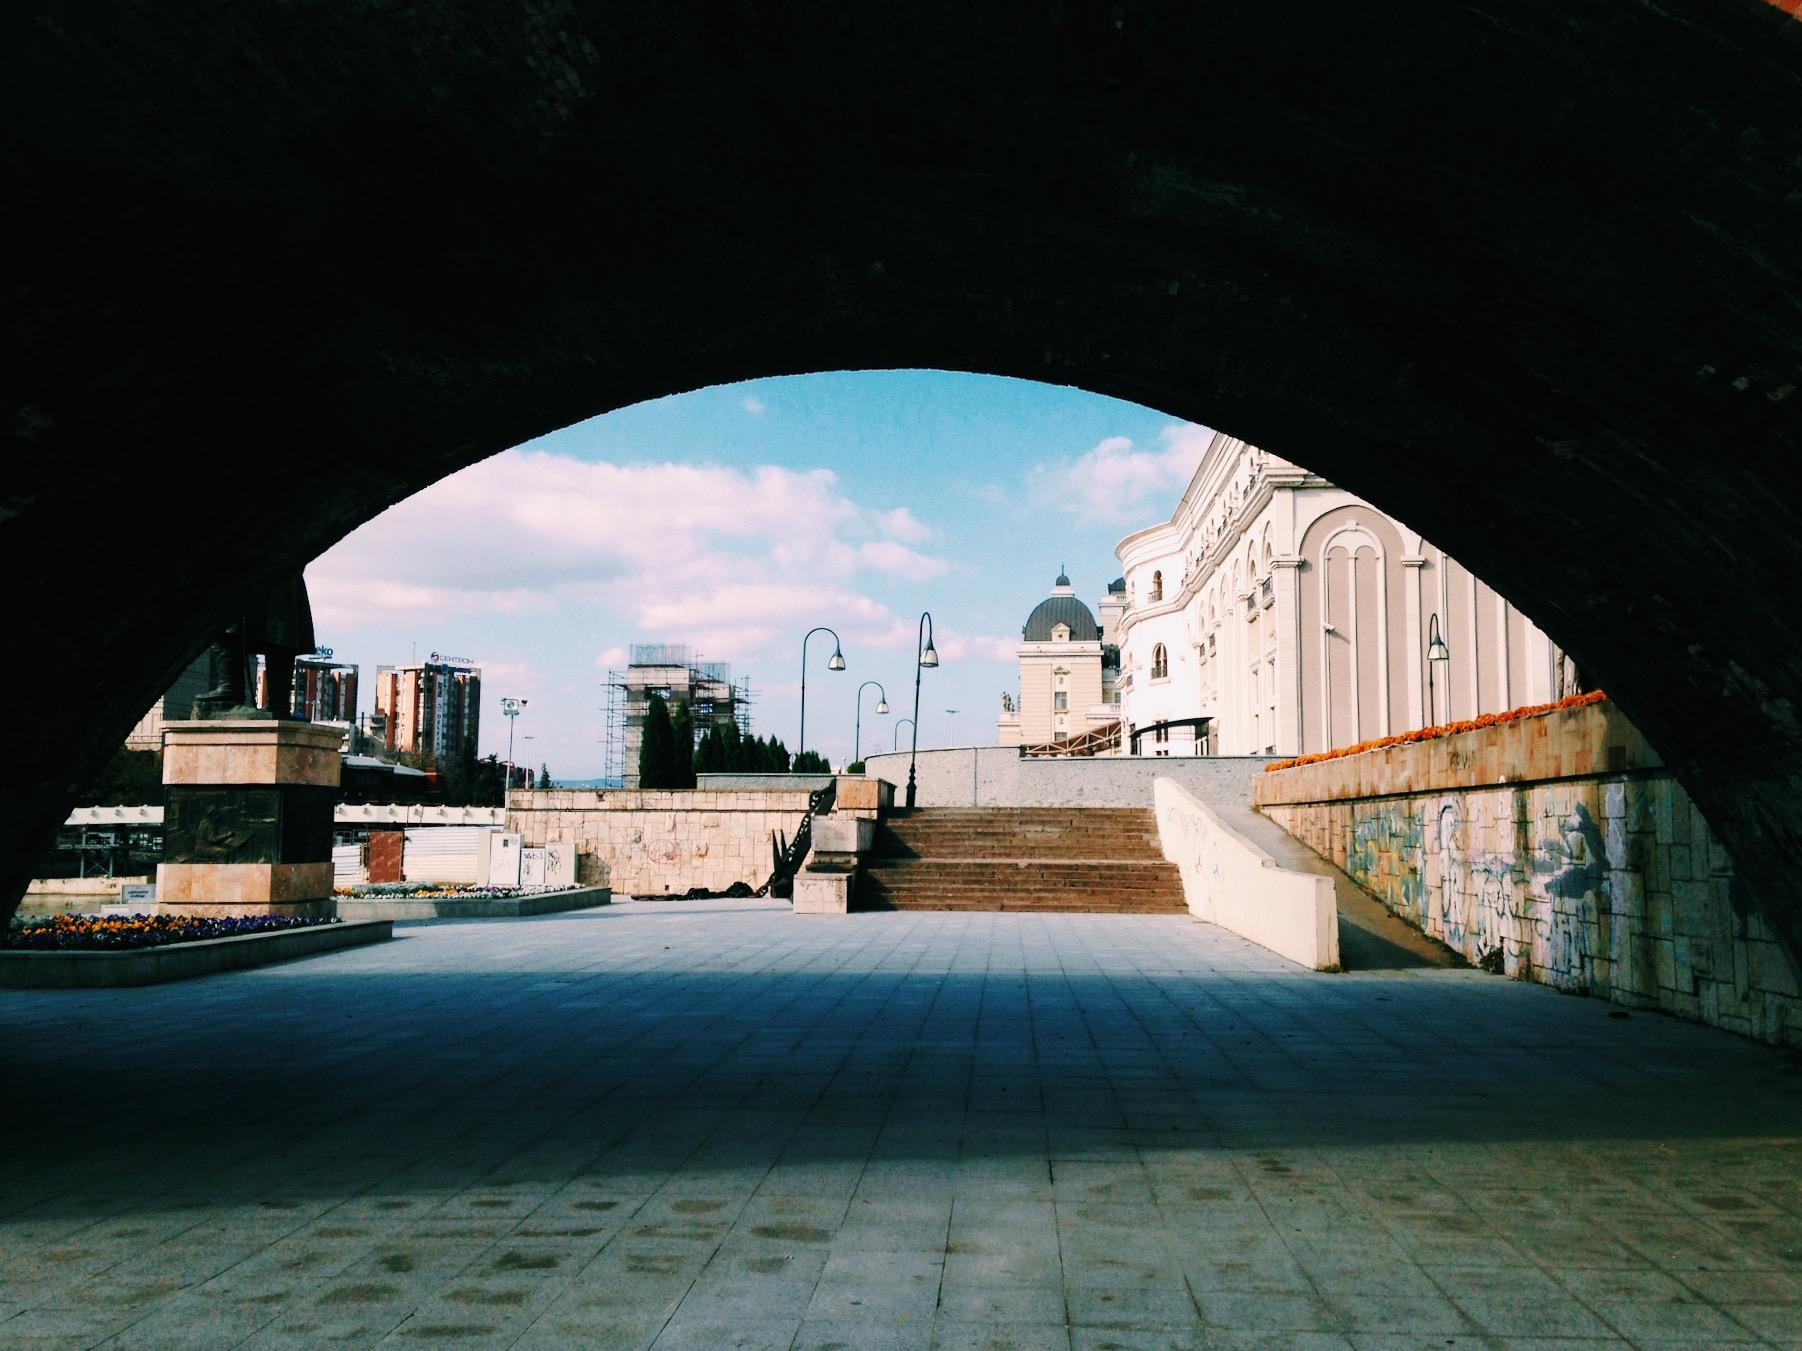 Under the Stone Bridge, there's a world [Skopje, 2017]